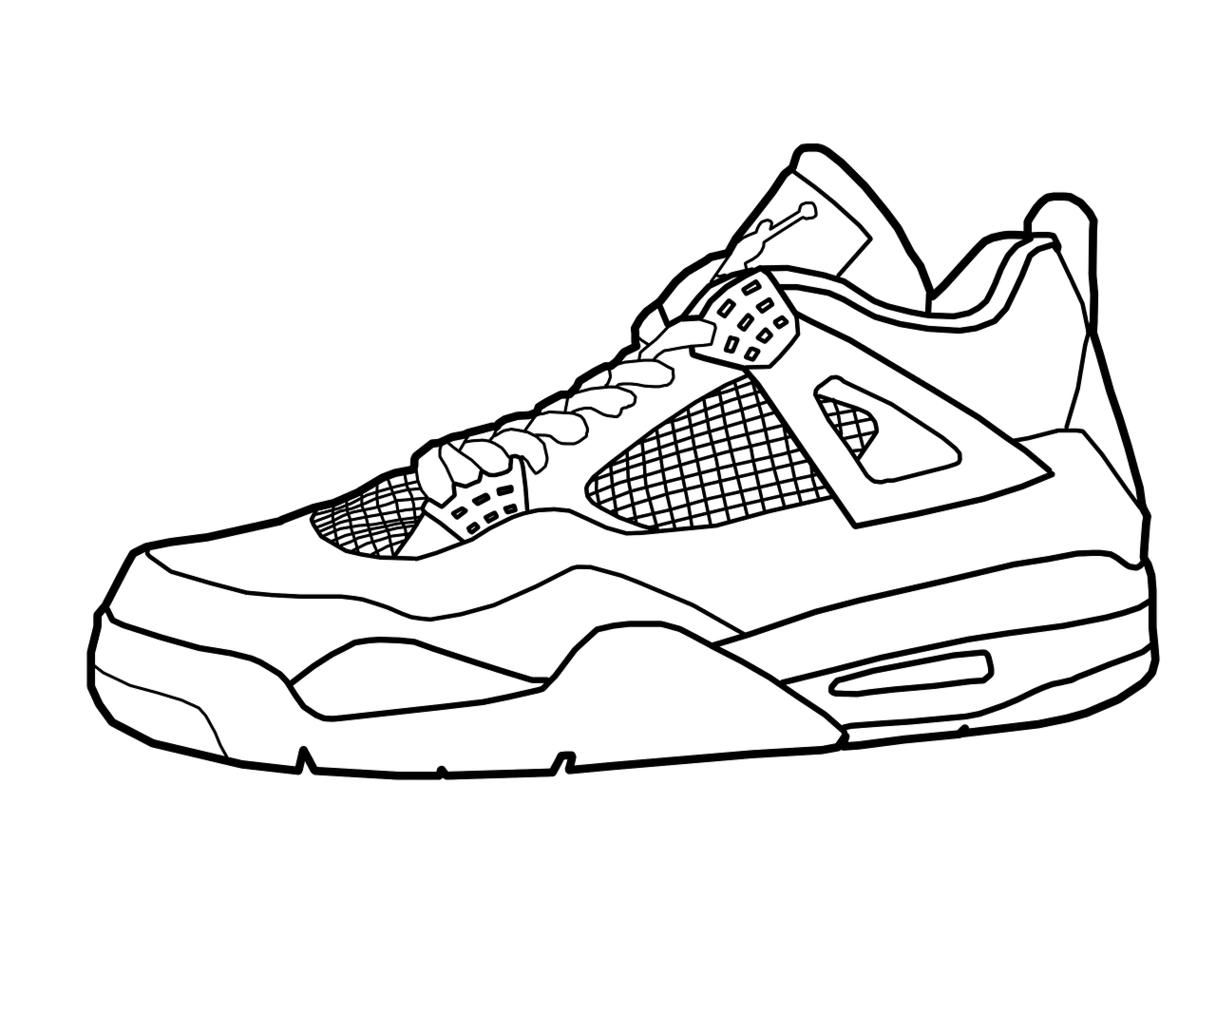 1216x1014 Basketball Shoes Drawing Basketball Wallpaper Michael Jordan Shoes